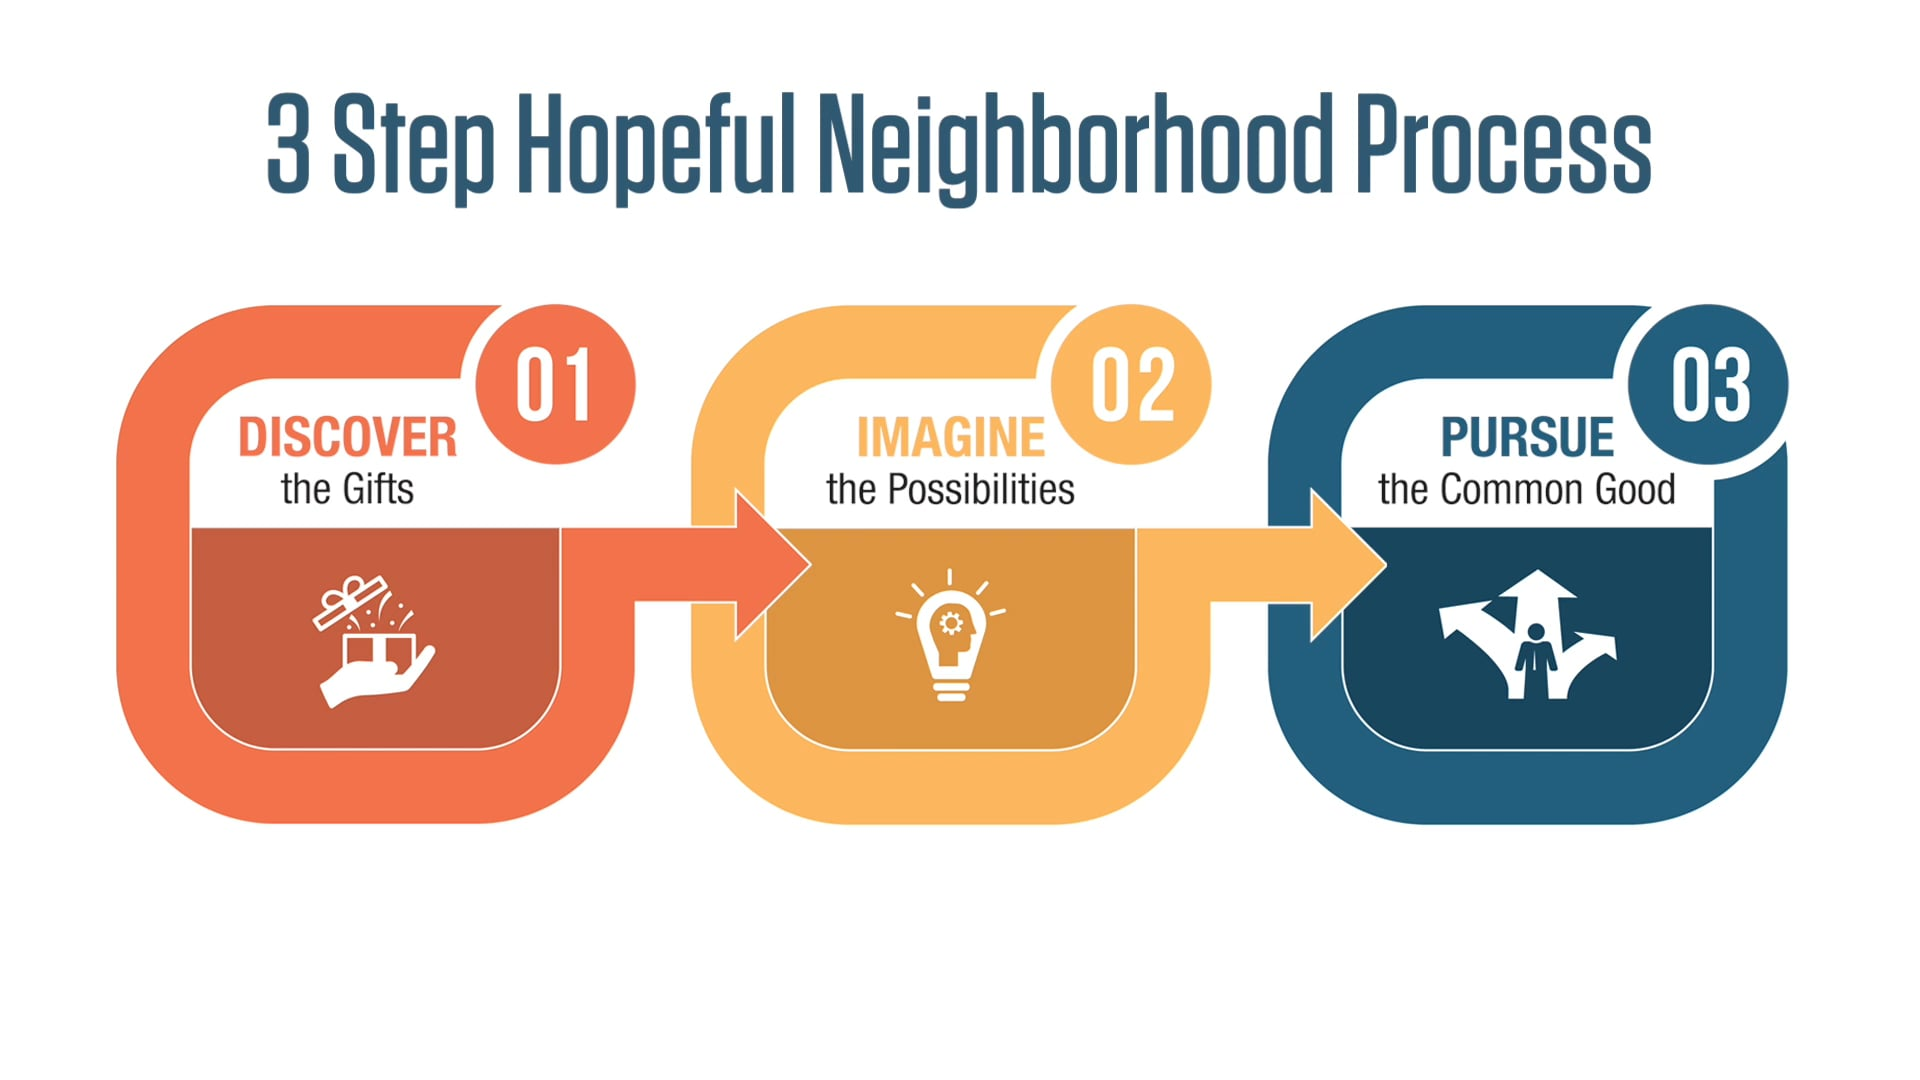 Welcome to the Hopeful Neighborhood Process